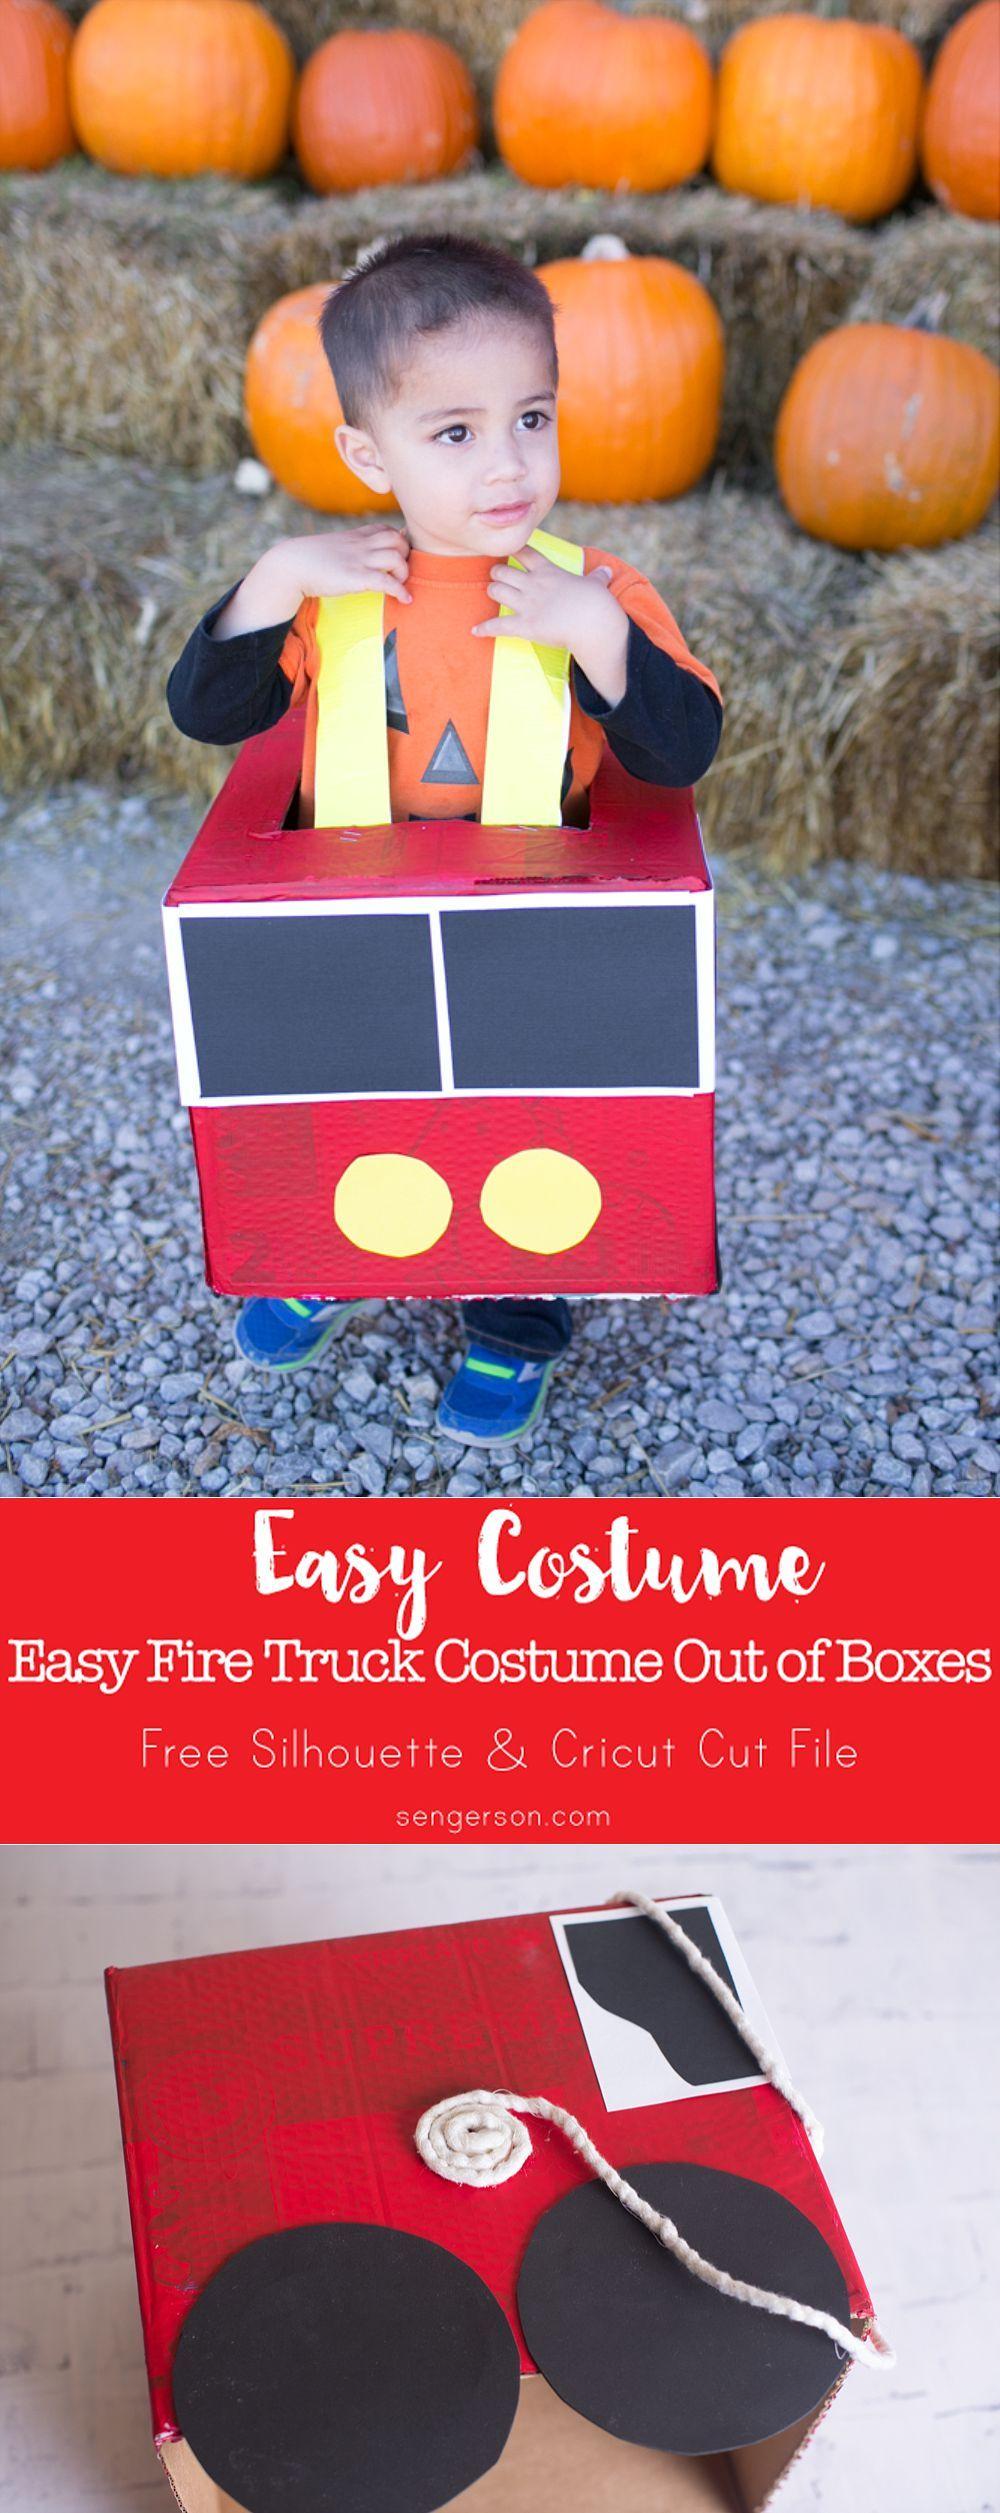 DIY Fire Truck Costume Fire trucks, Truck crafts, Fire